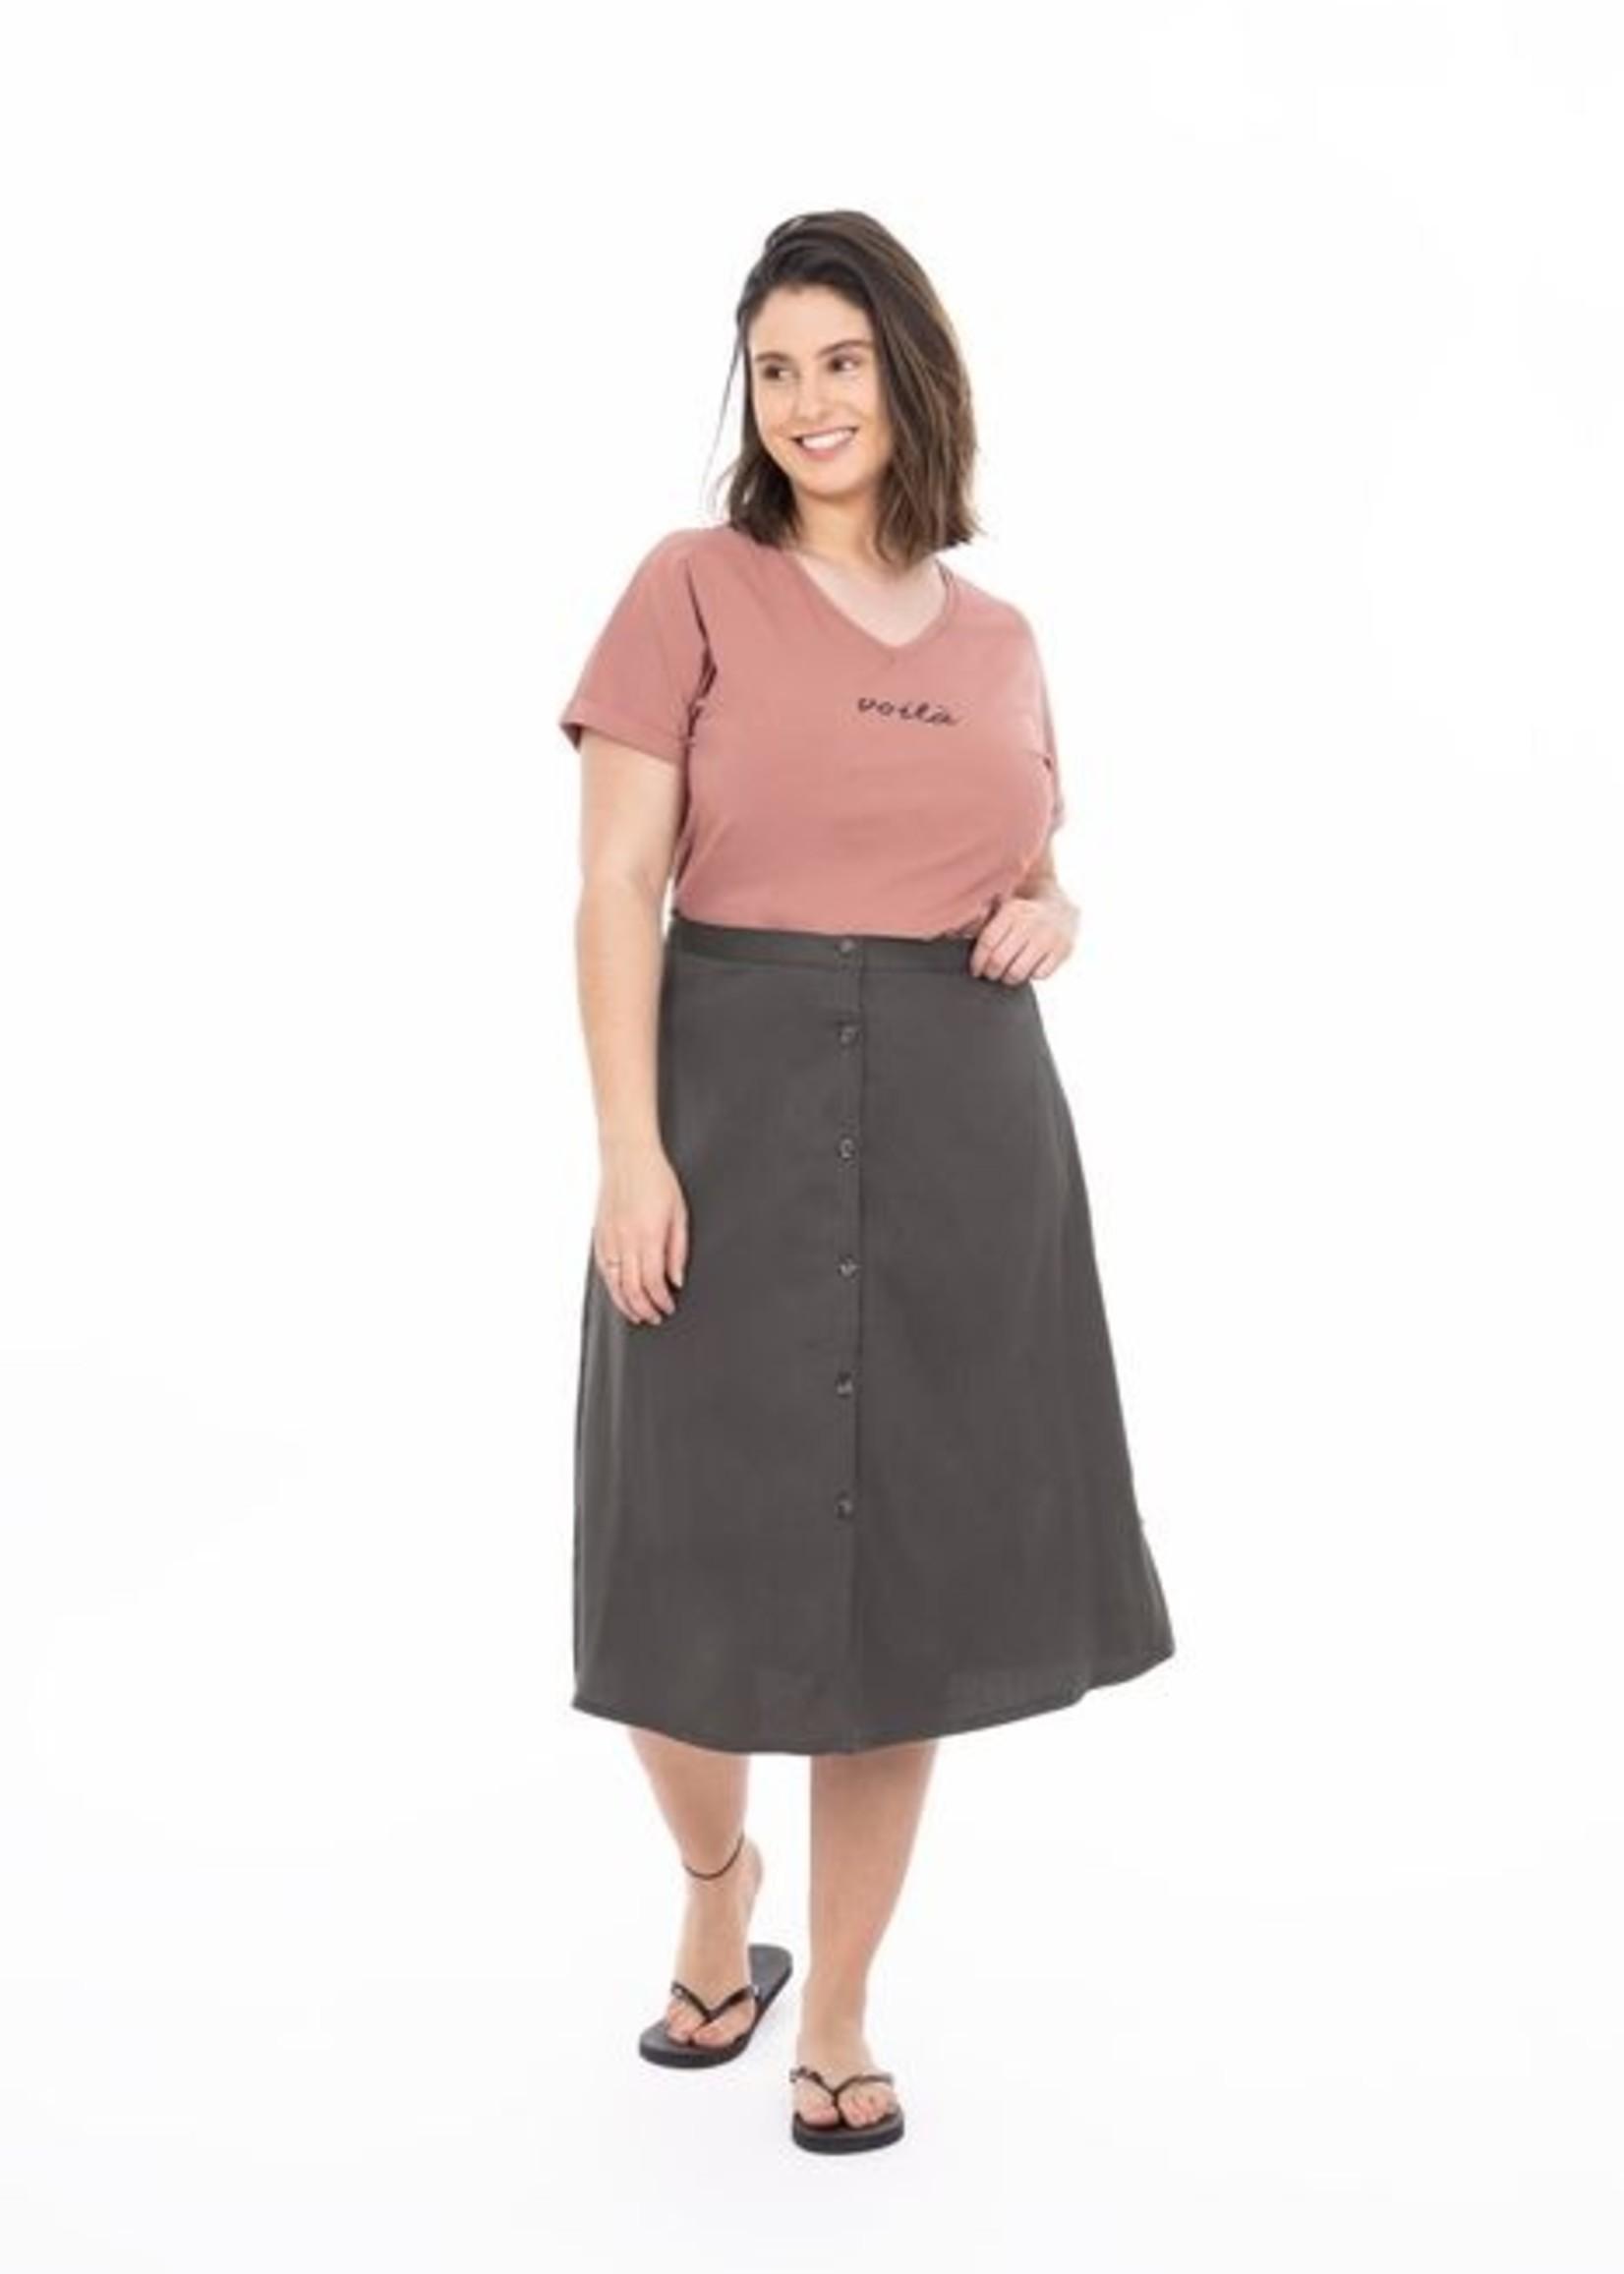 Zusss basic t-shirt met V-hals voila rouge XL